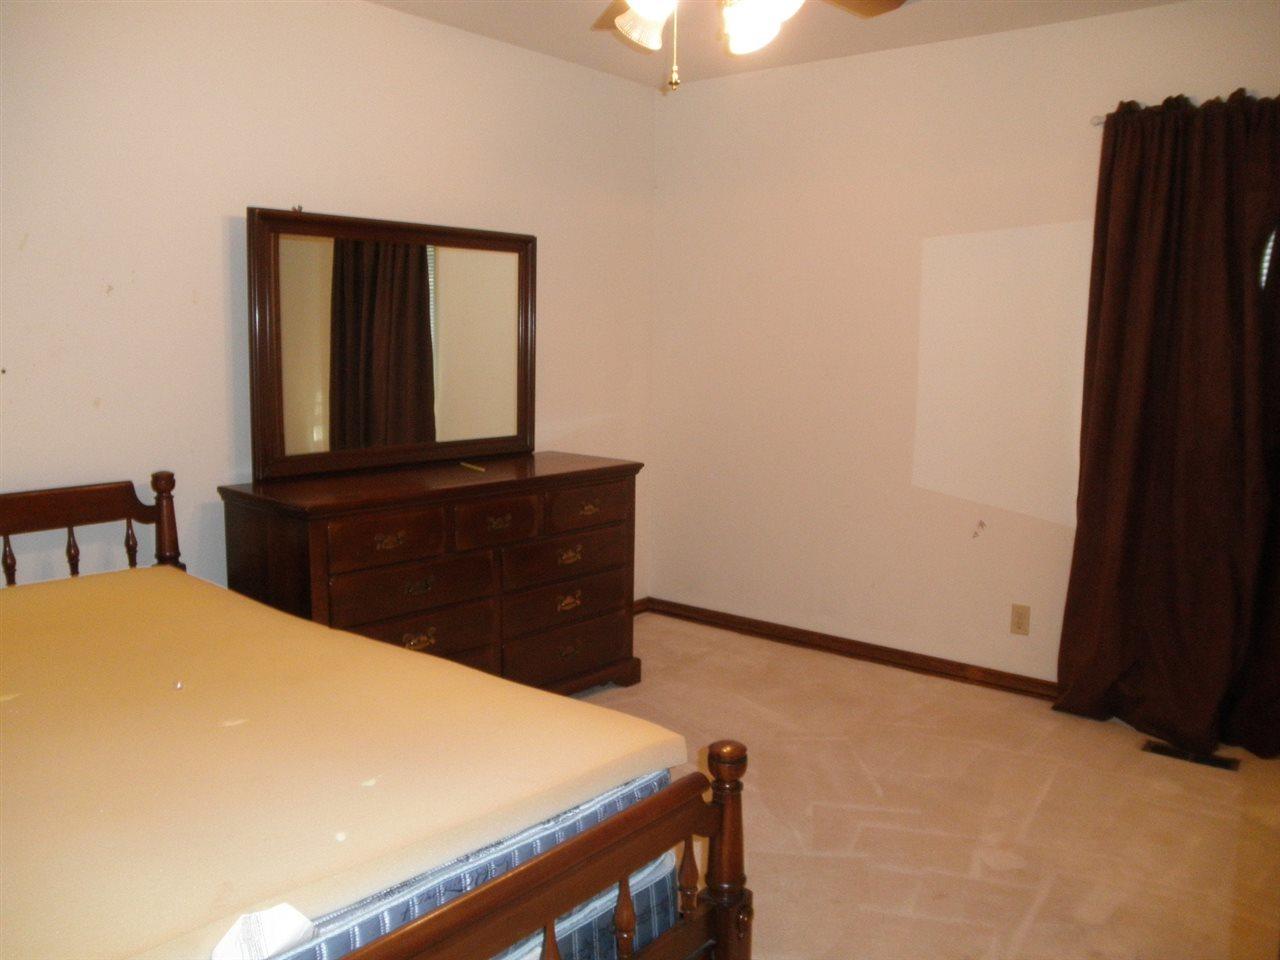 Sold Intraoffice W/MLS | 2 Woodcrest  Ponca City, OK 74604 21